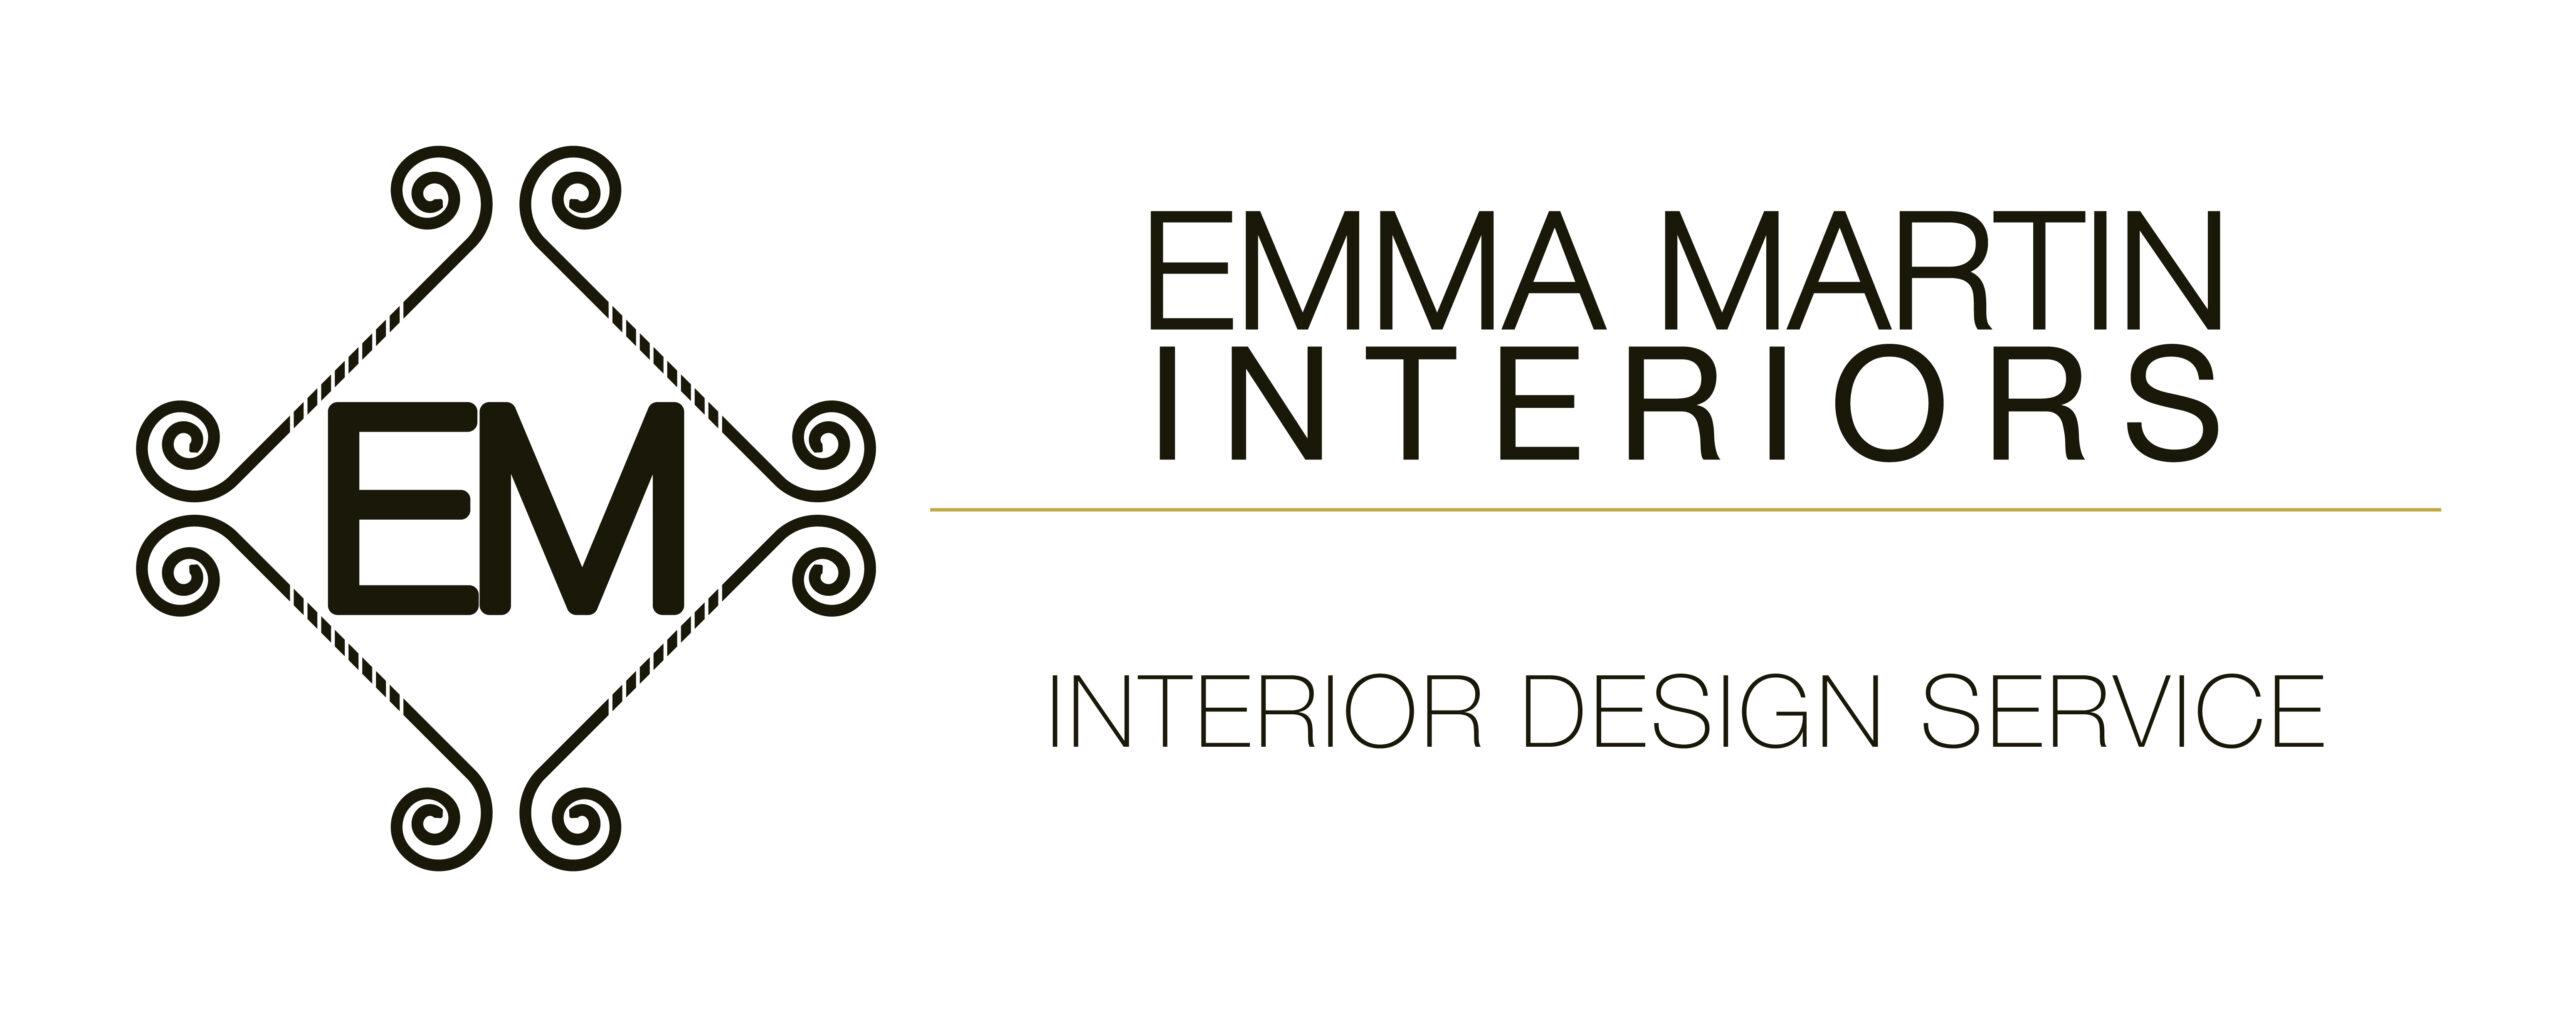 Emma Martin Interiors